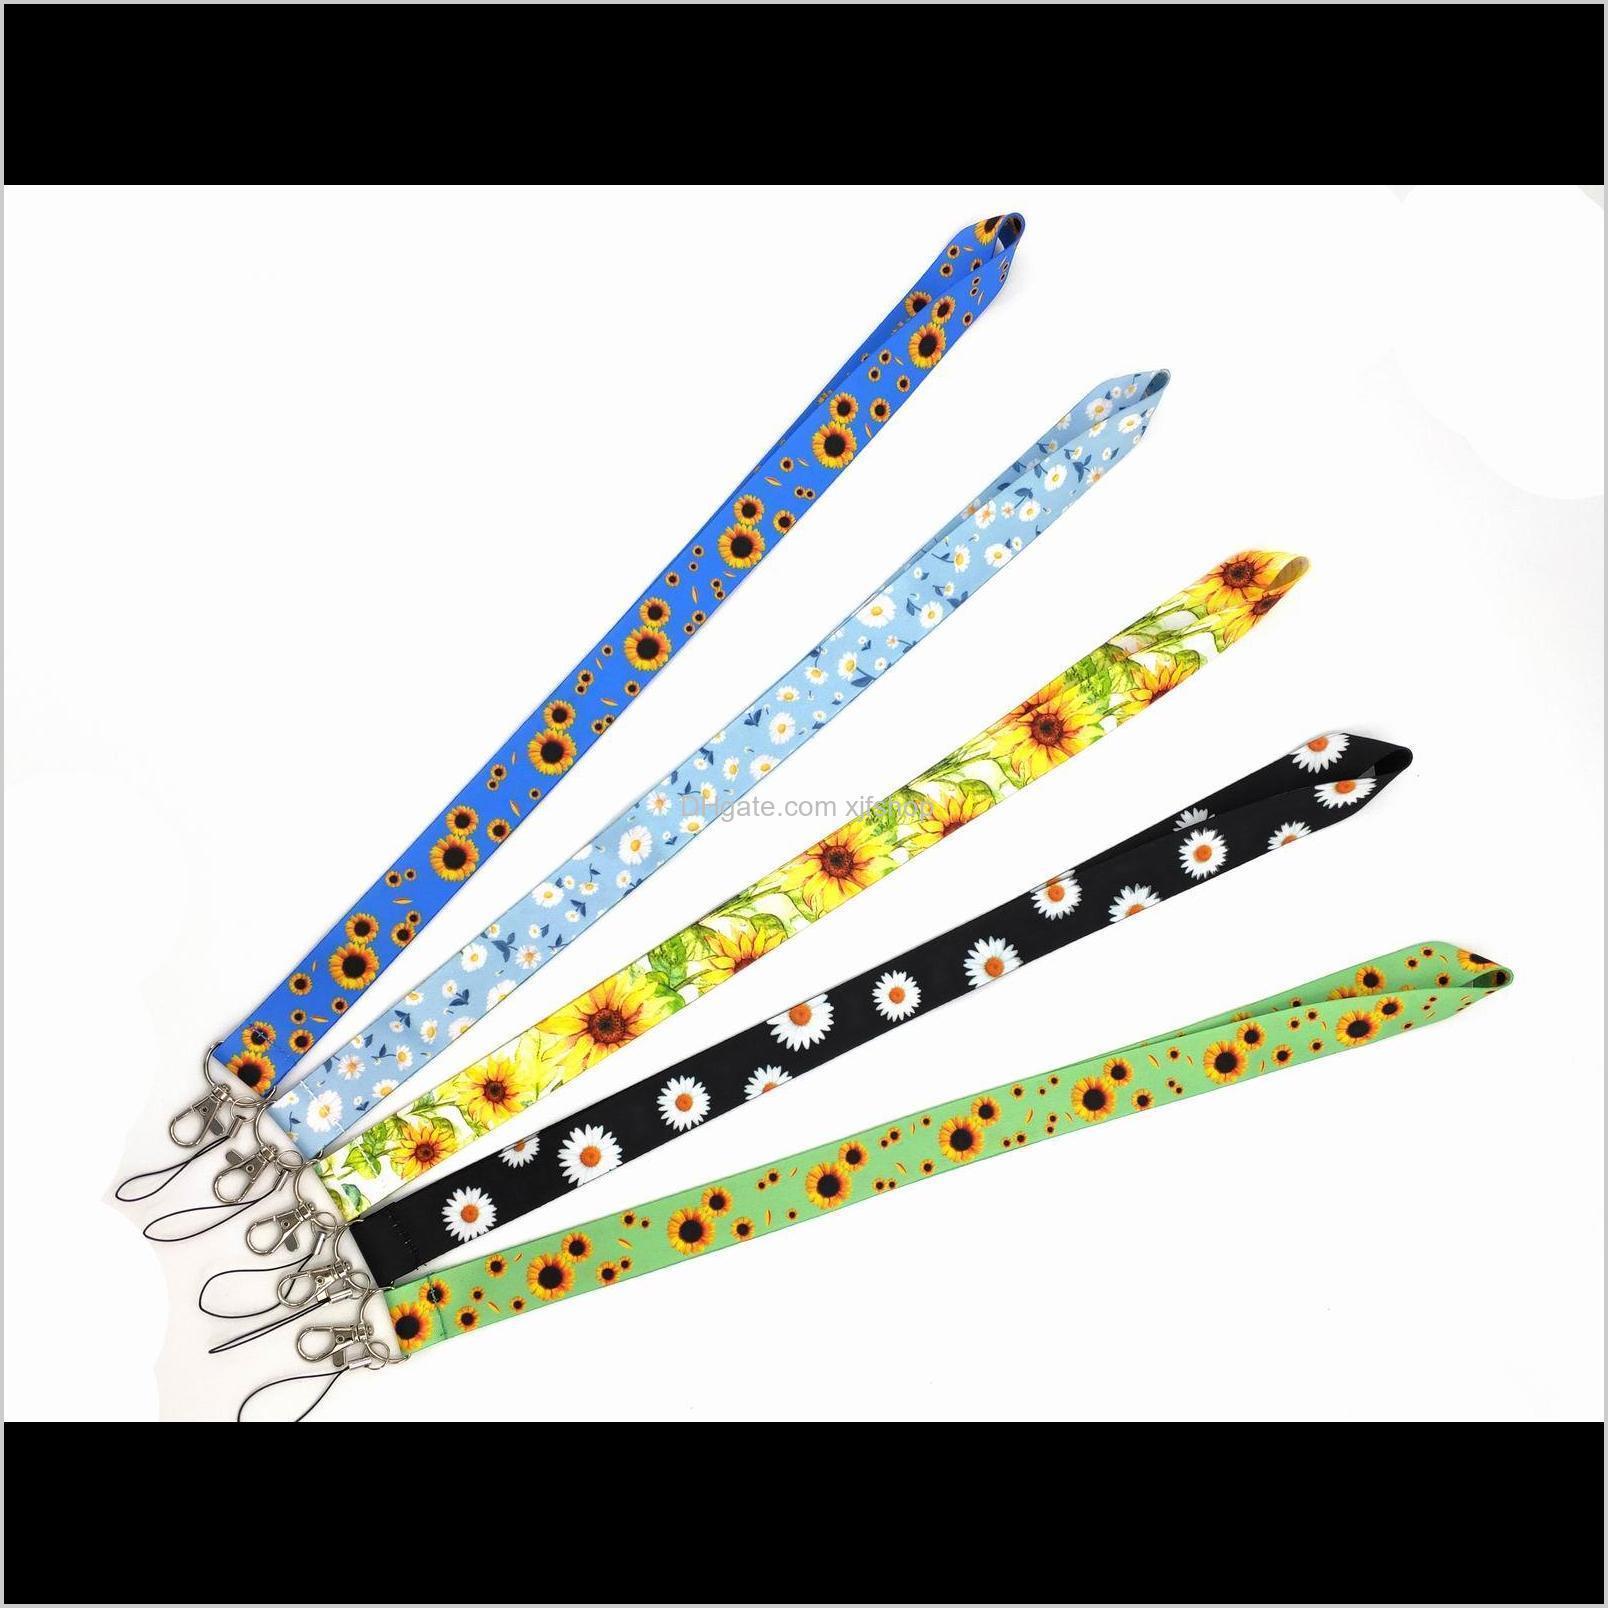 10pcs flower chrysanthemum sunflower lanyard for keys mobile phone strap id badge holder rope keychain charms diy keychain accessories